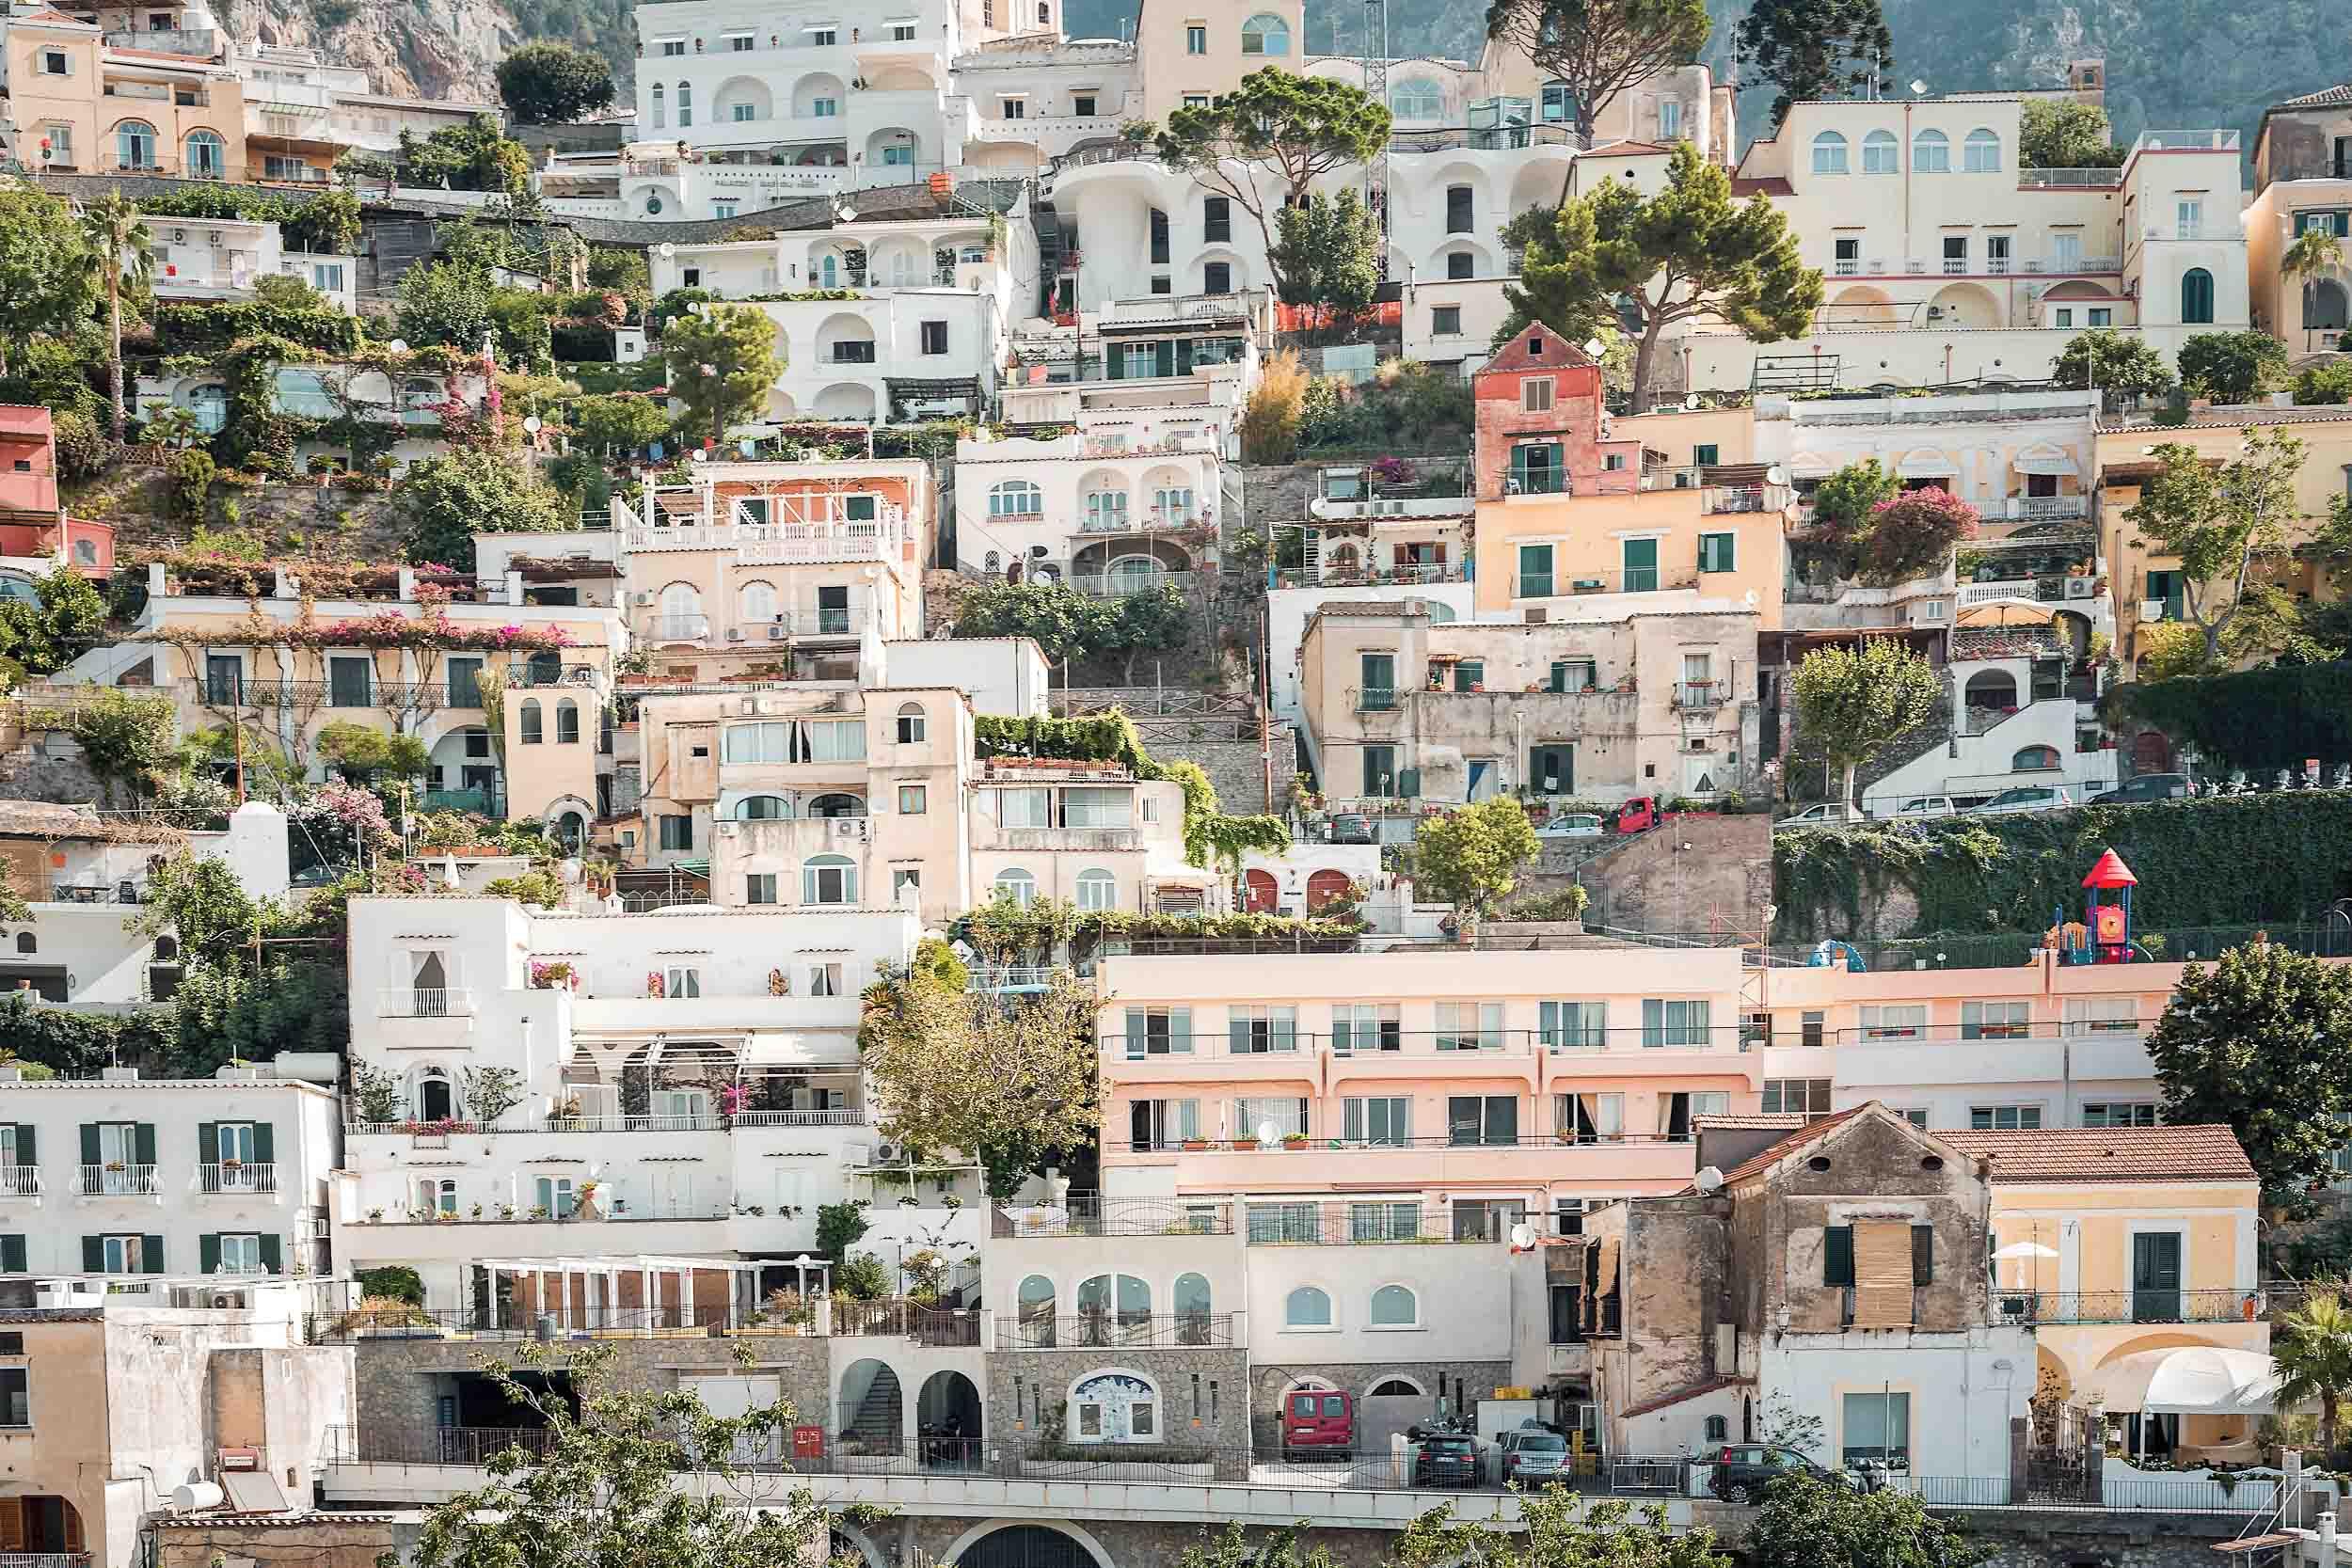 Where to stay on the Amalfi Coast: Positano